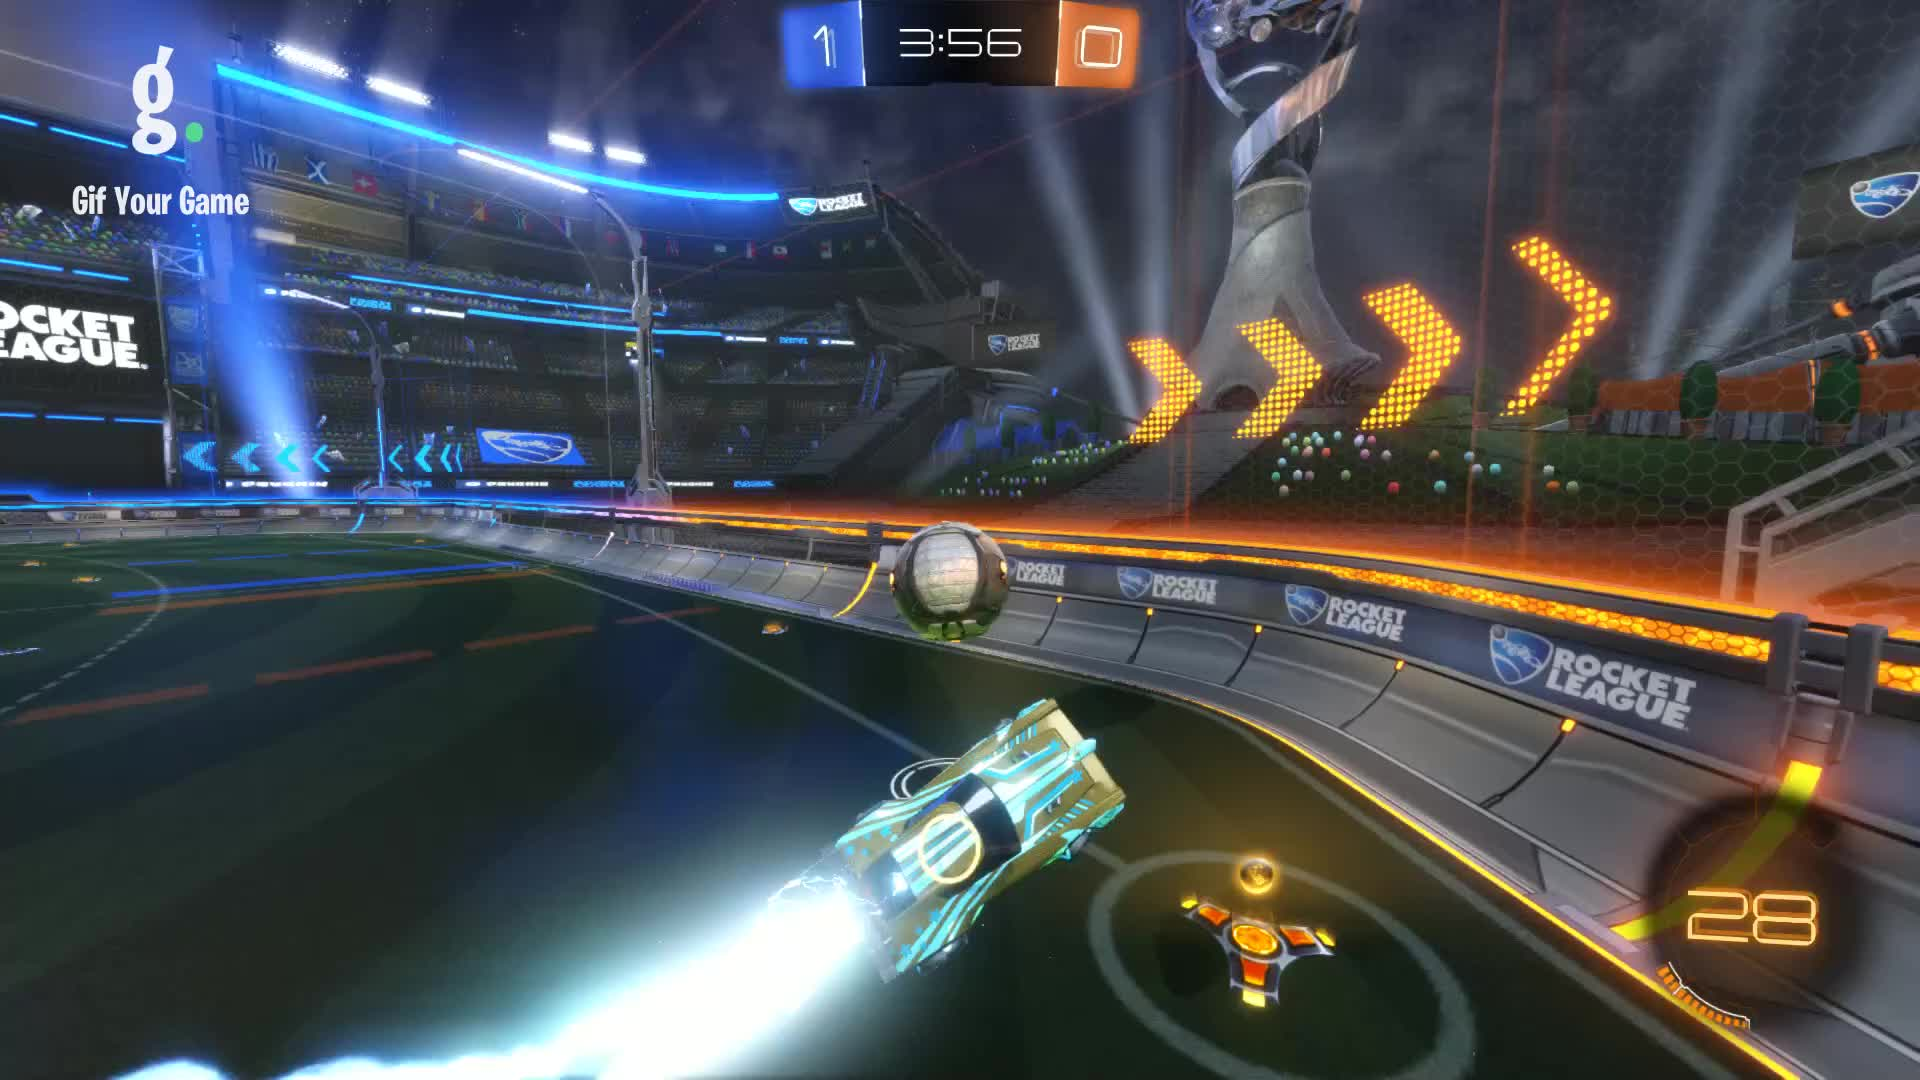 Gif Your Game, GifYourGame, Goal, Jondis, Rocket League, RocketLeague, Goal 2: Jondis GIFs